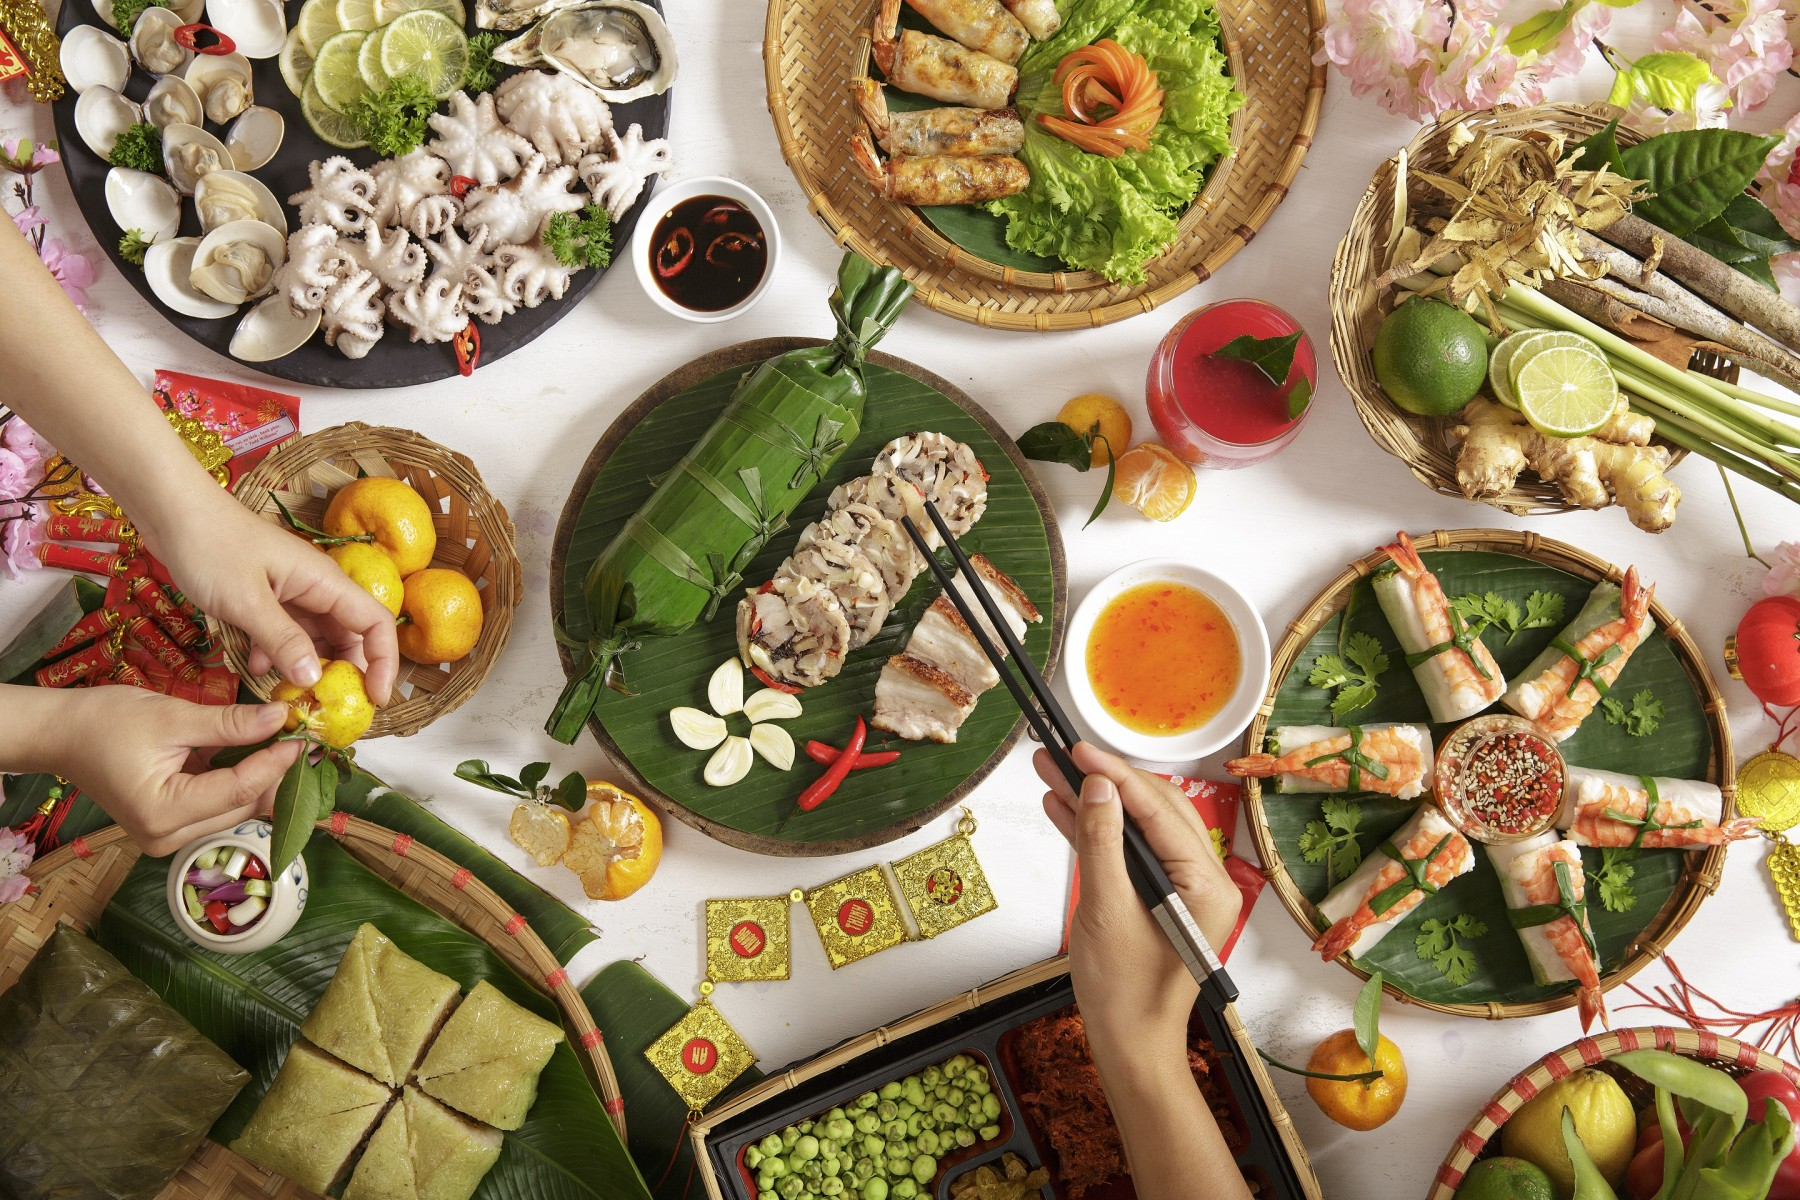 Tiệc-tự-chọn-ẩm-thực-quốc-tế-International-Buffet-Best-buffet-in-Danang-Restaurant-Epice-Danang-Restaurant